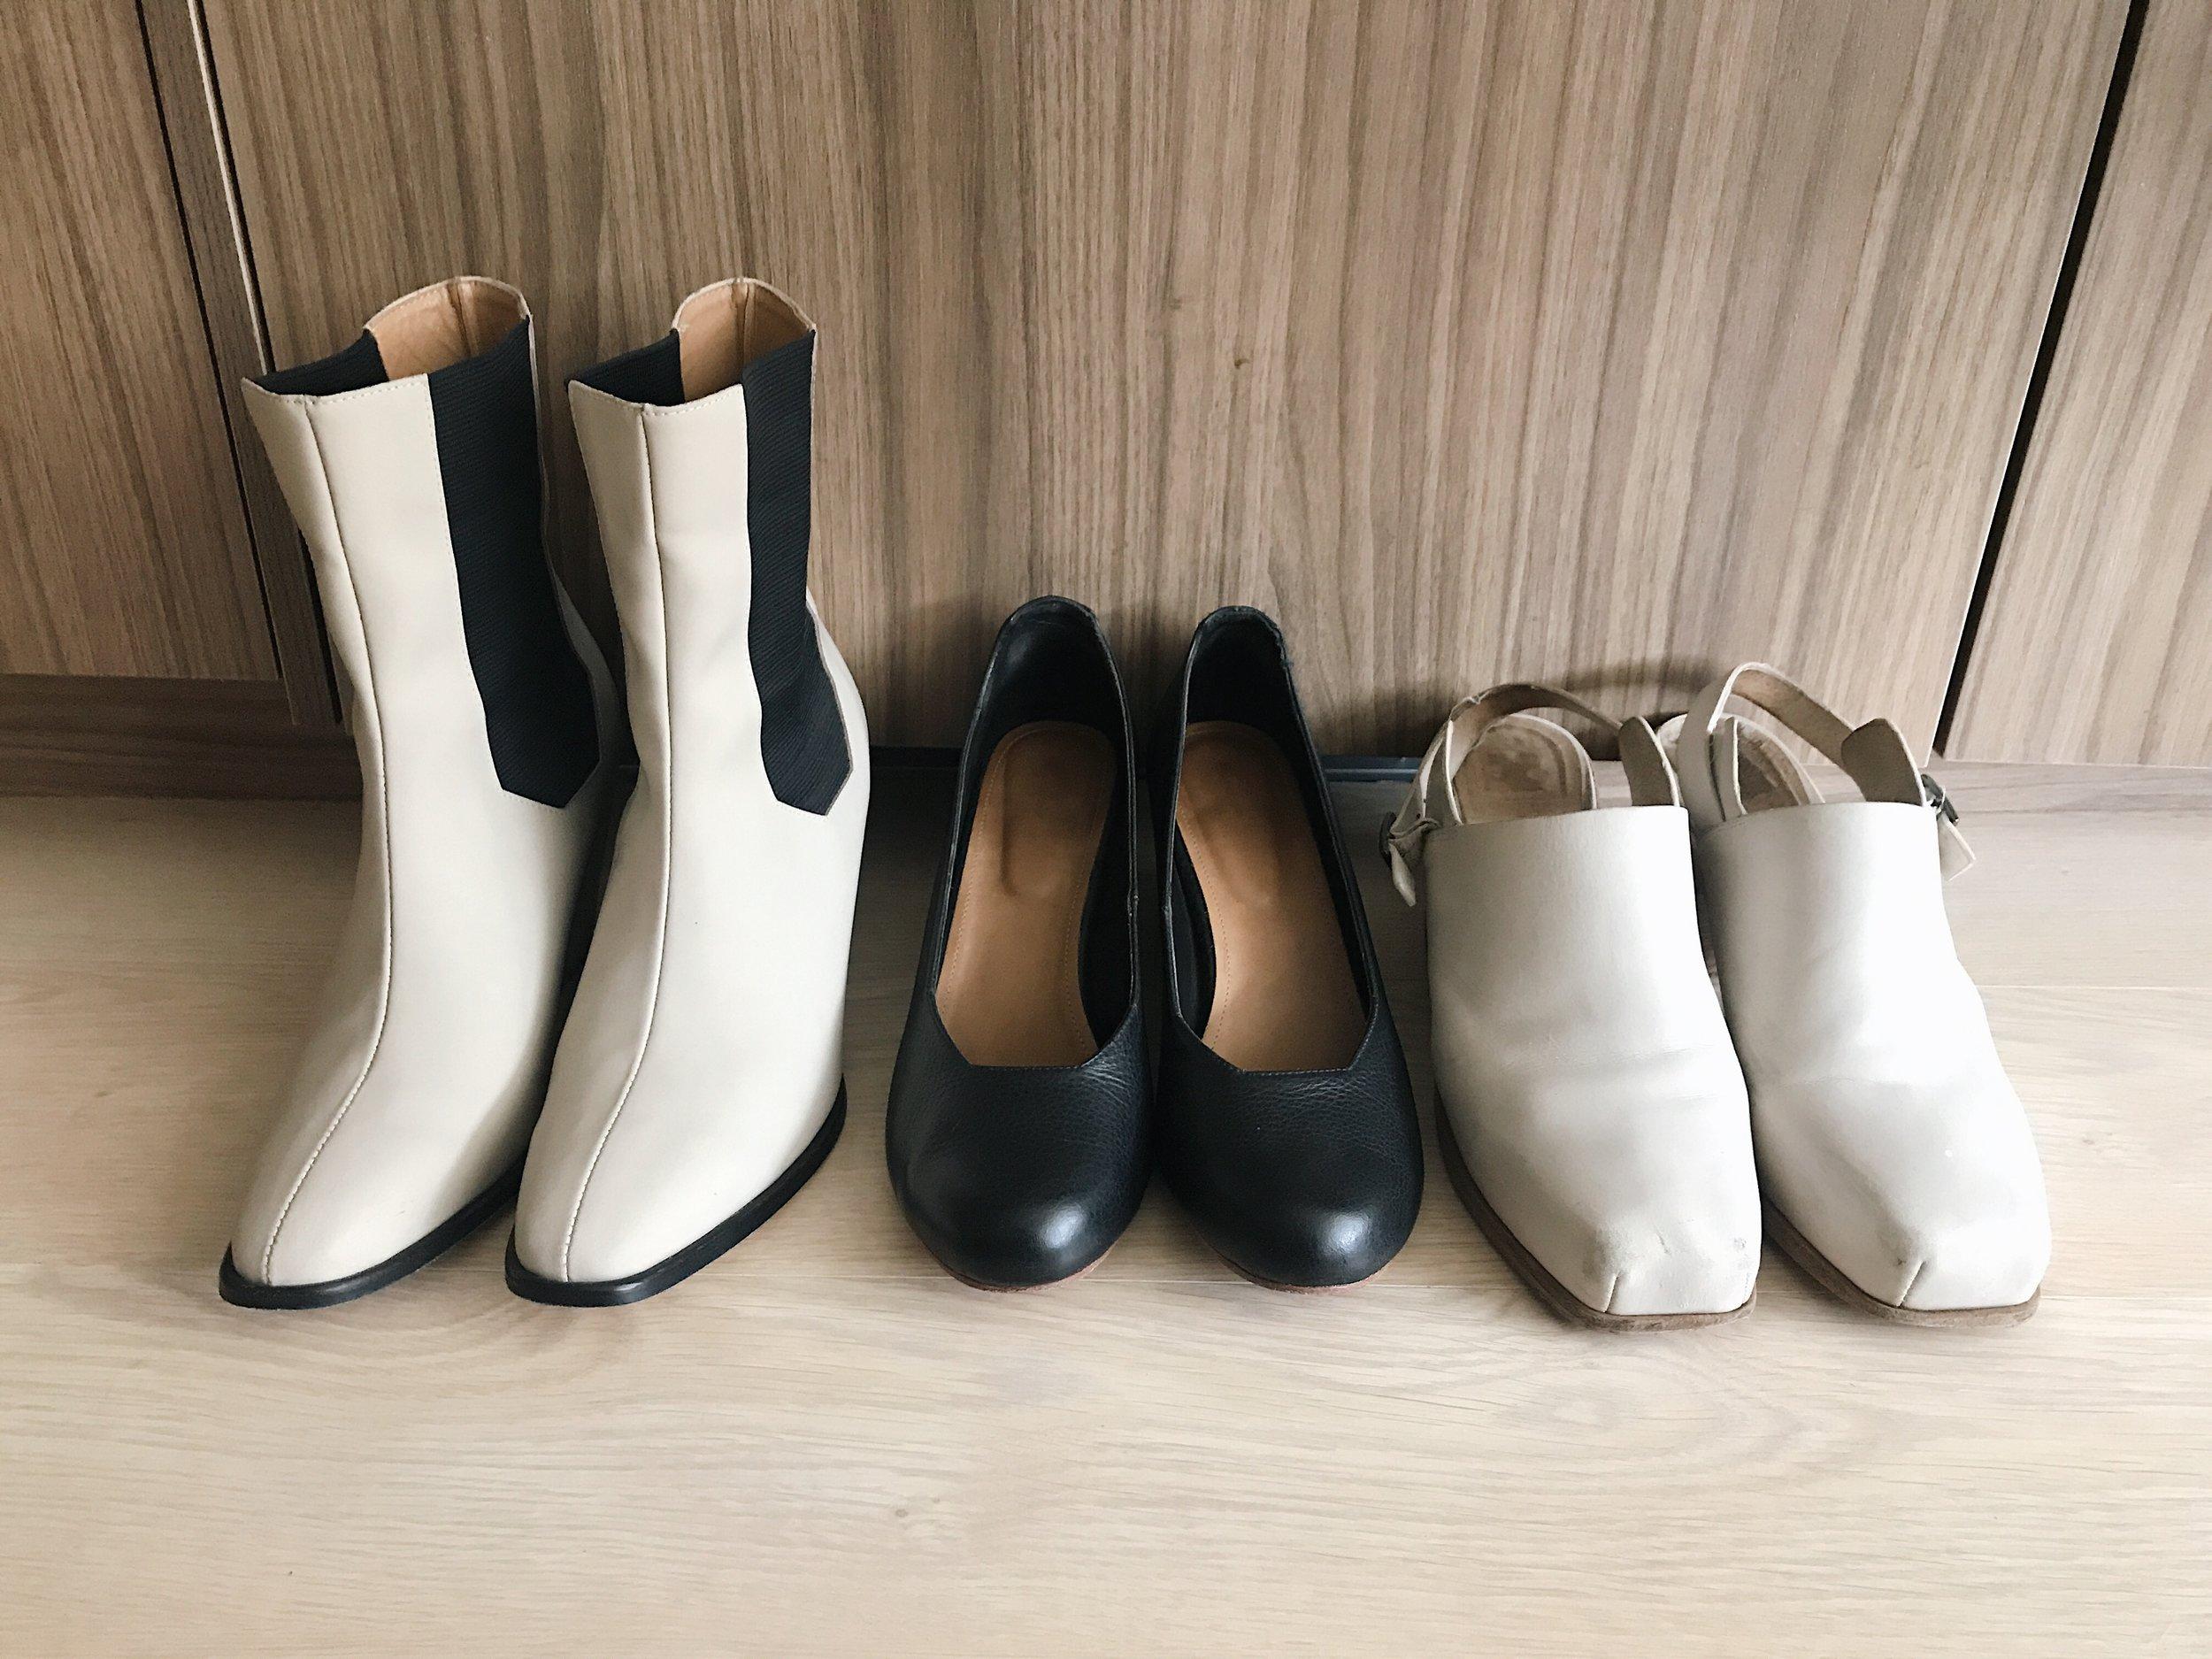 Shoe formation.JPG